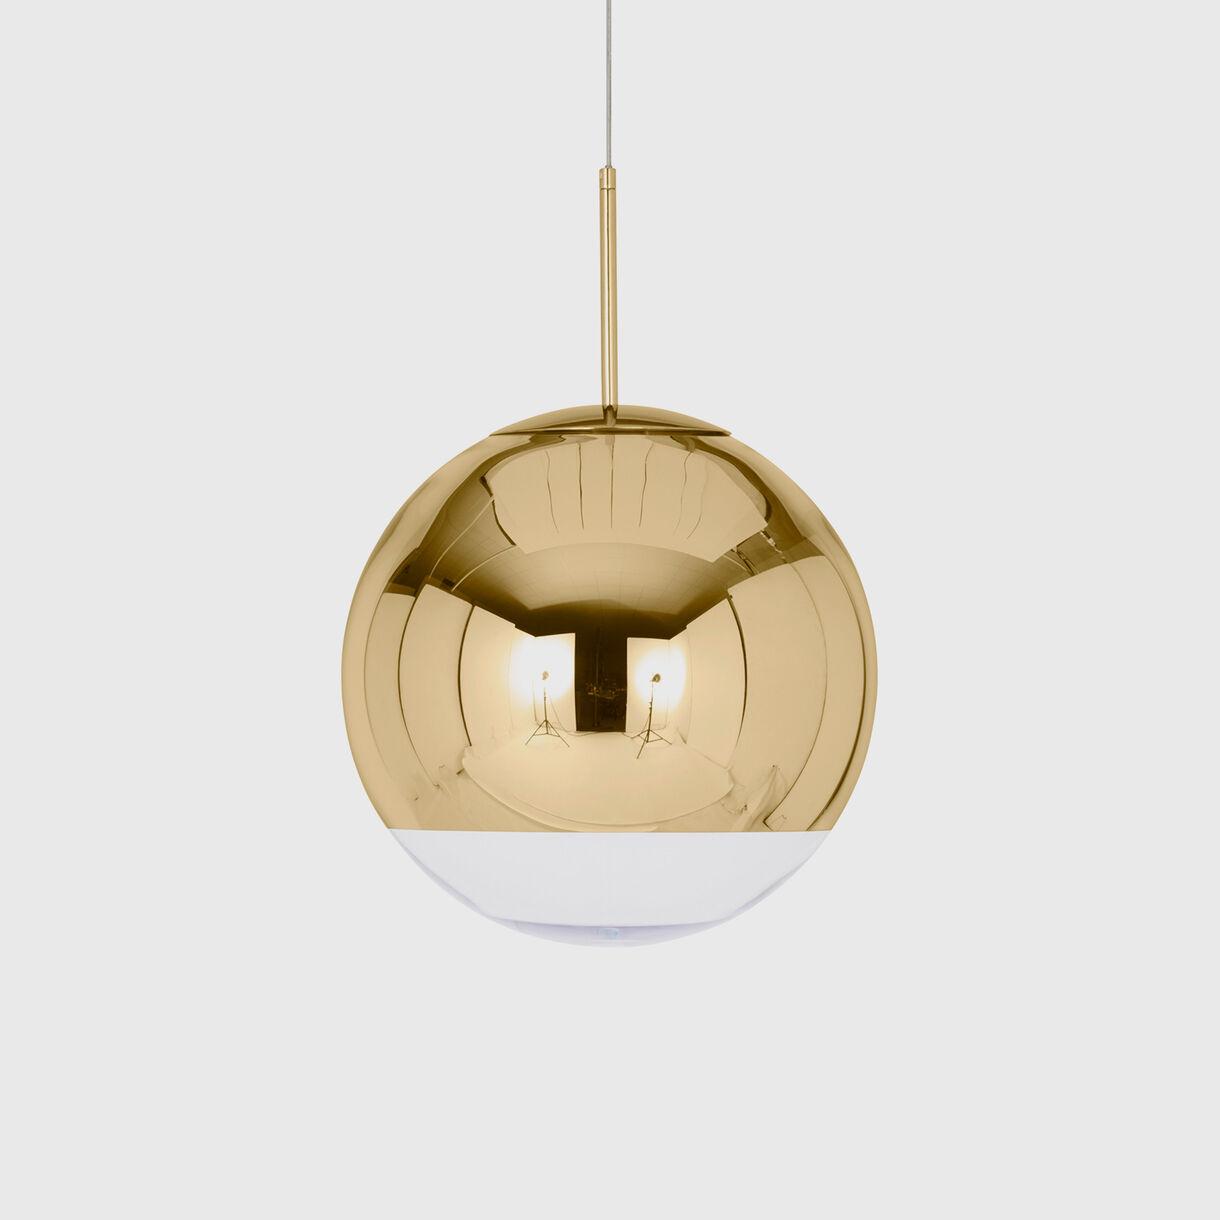 Mirror Ball Pendant 400mm, Gold